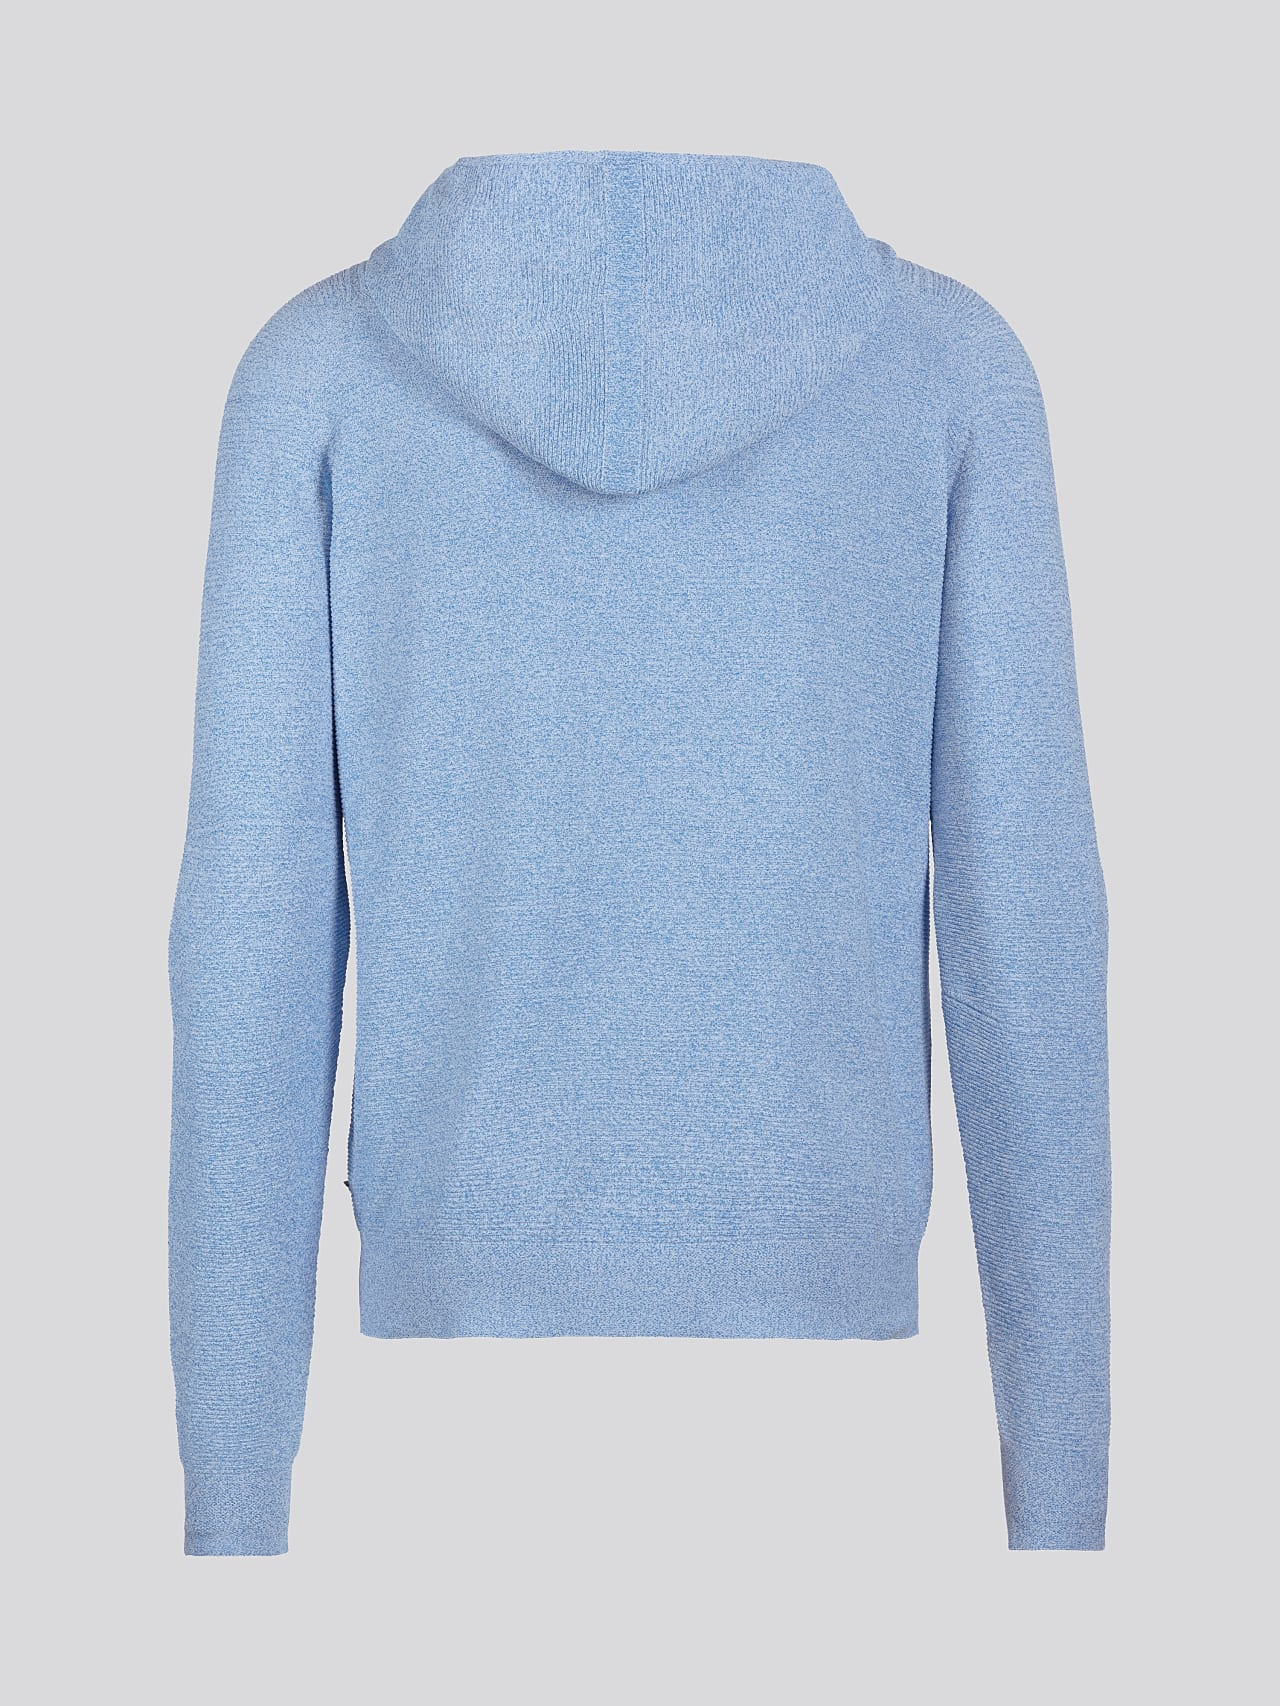 FURAP V3.Y5.01 Seamless Knit Hoodie blue / white Left Alpha Tauri